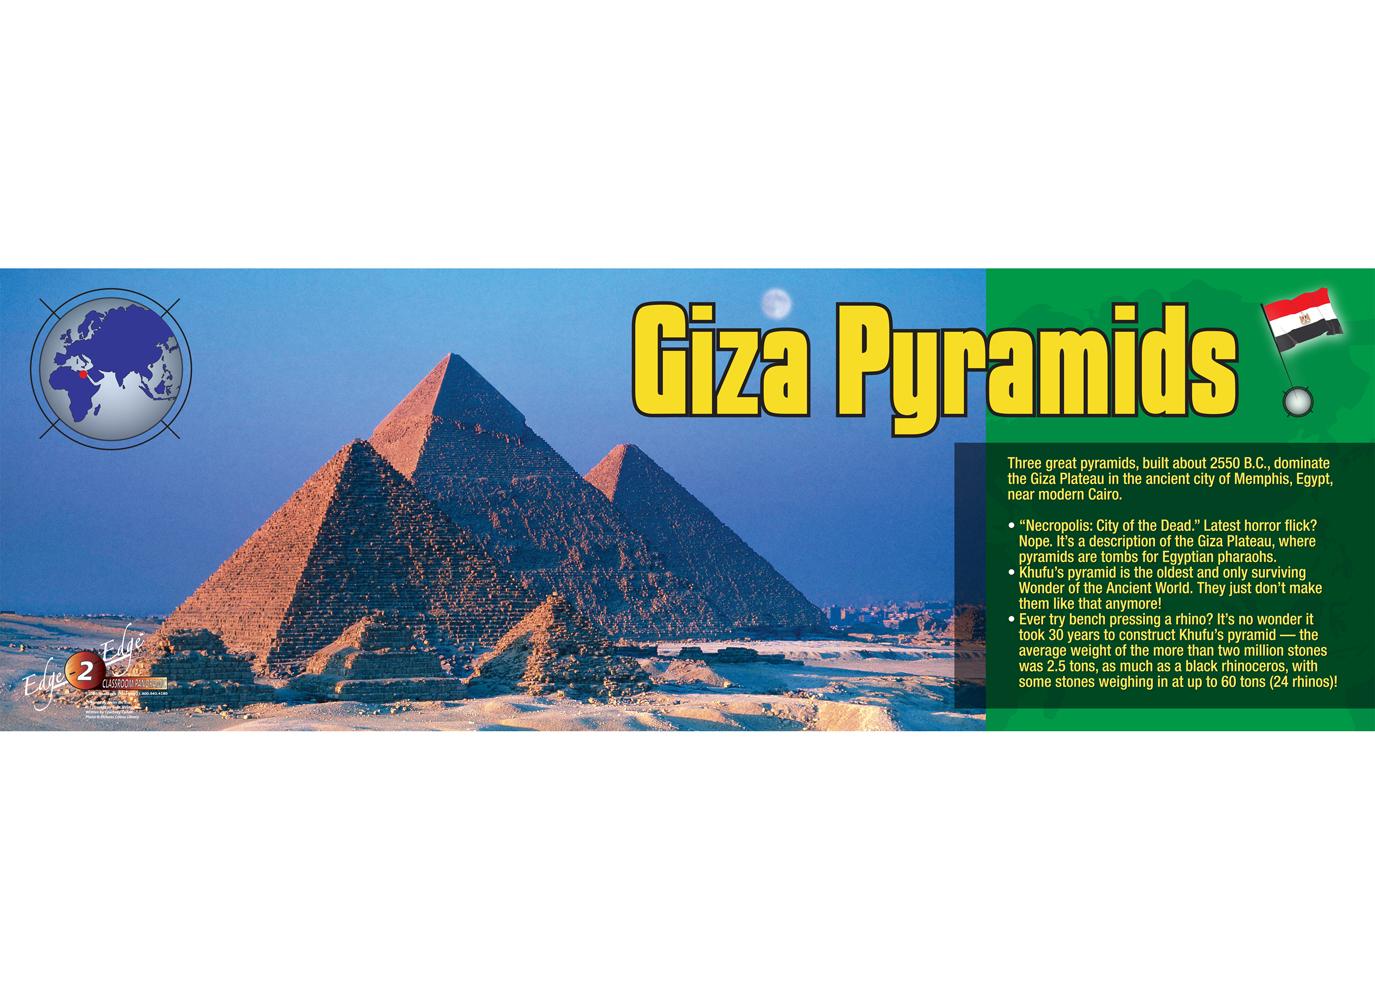 Giza Pyramids Panoramic Poster